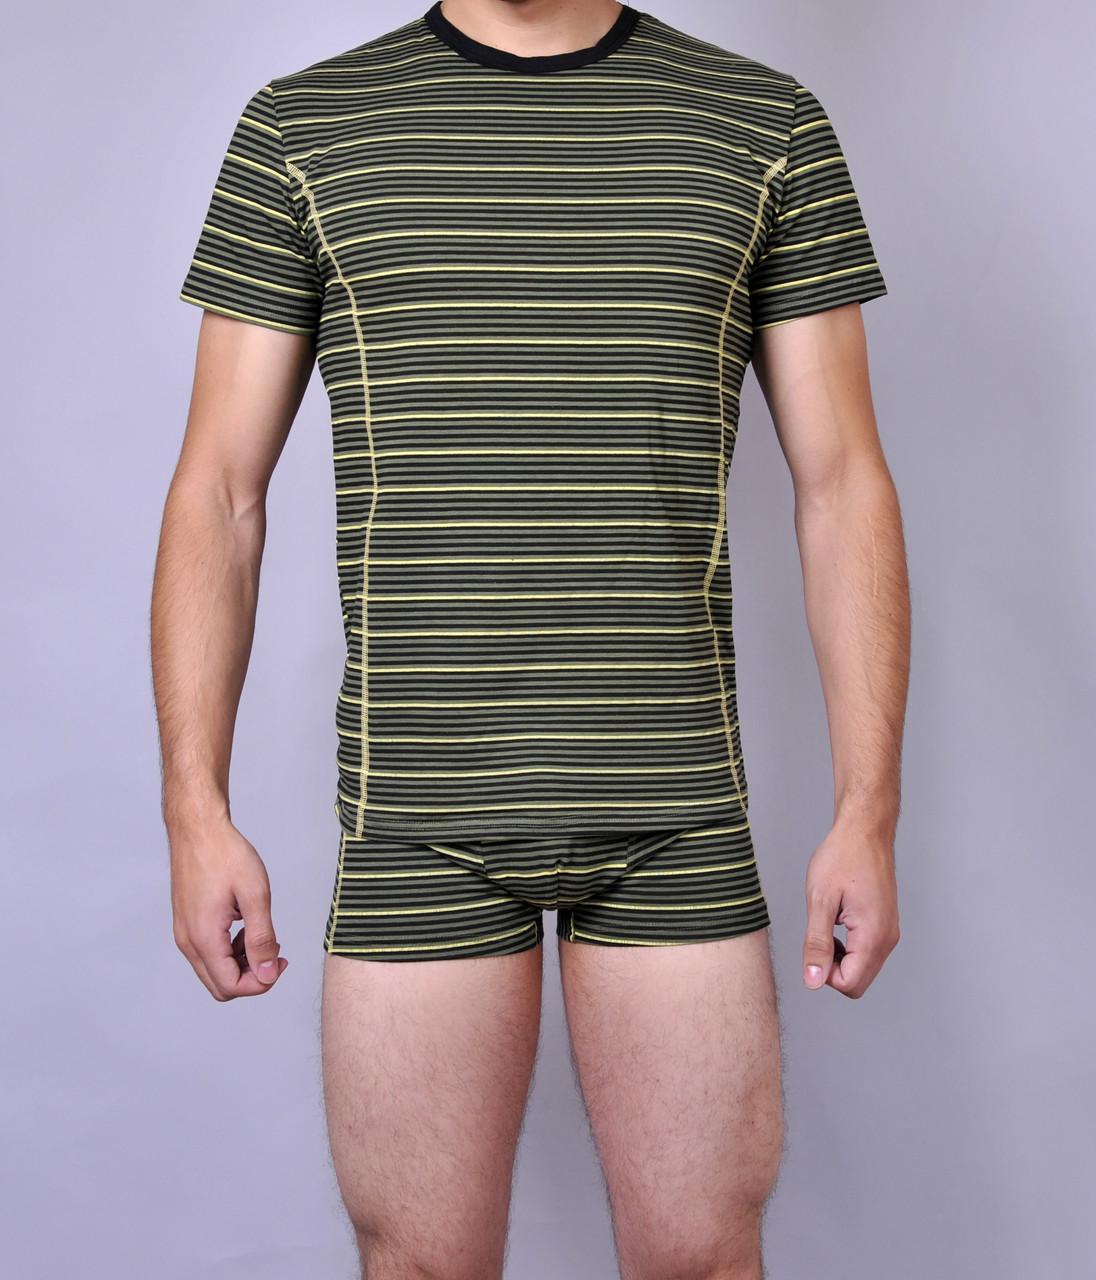 Мужская футболка  C+3 0115 L Зеленый